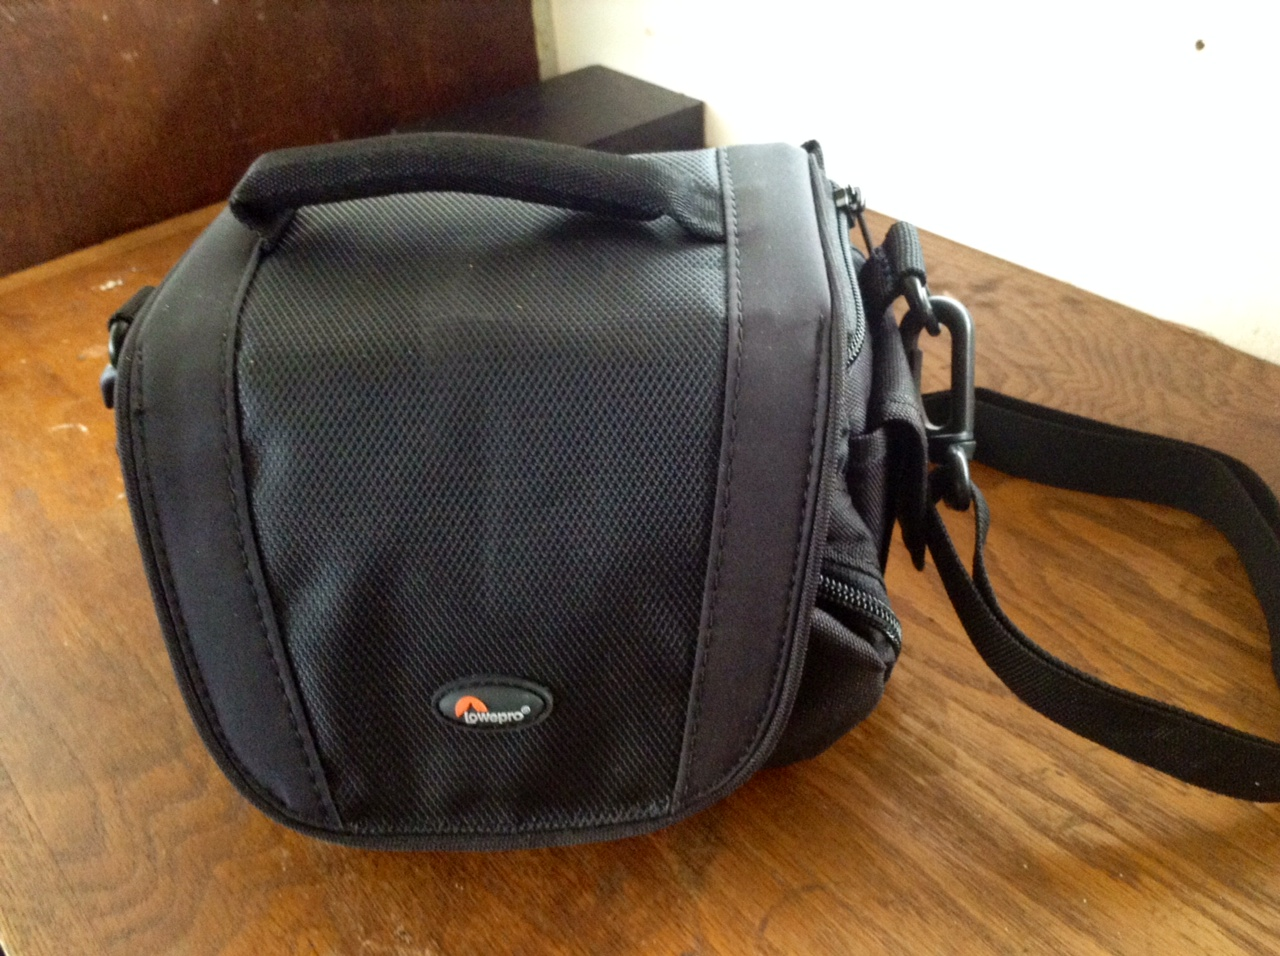 Carrying Case Of Fz1000 Panasonic Compact Camera Talk Forum Lowepro Adventura Sh 120 Ii Black View Original Size